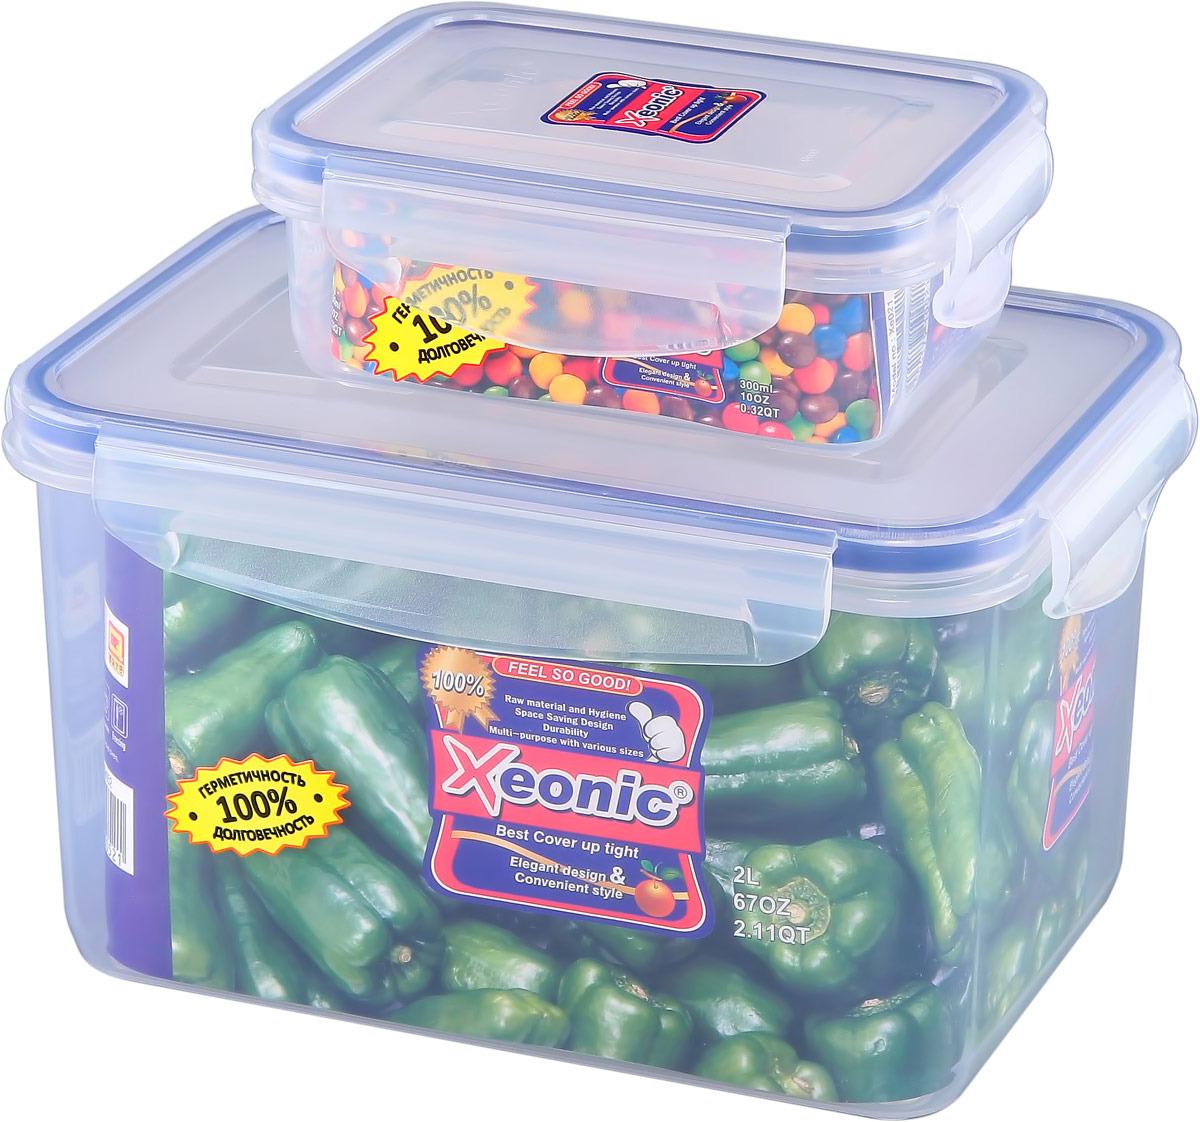 Набор контейнеров Xeonic, 2 предмета. 810705